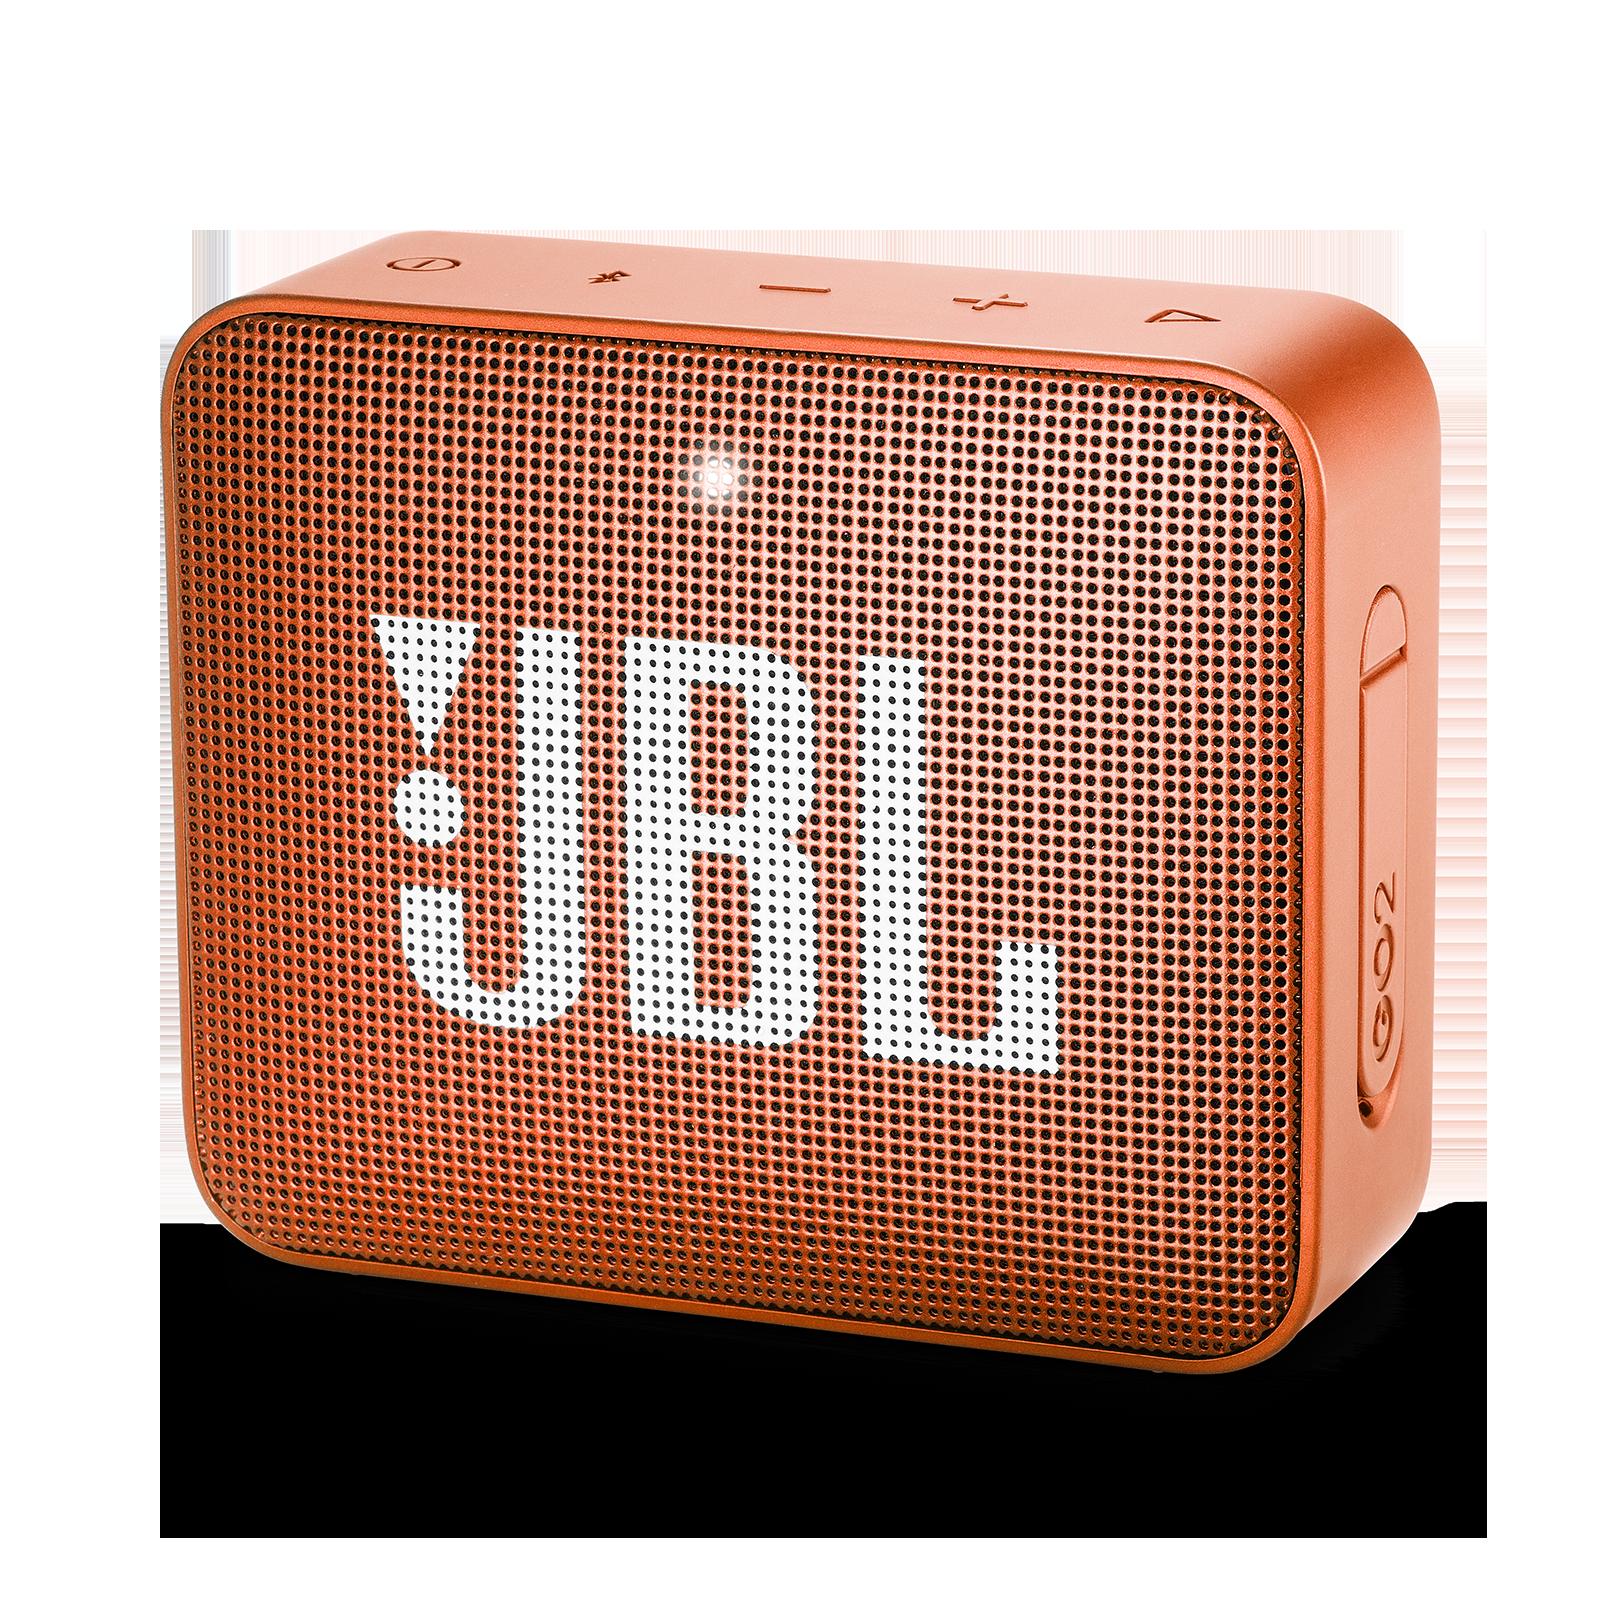 JBL GO 2 - Coral Orange - Portable Bluetooth speaker - Hero